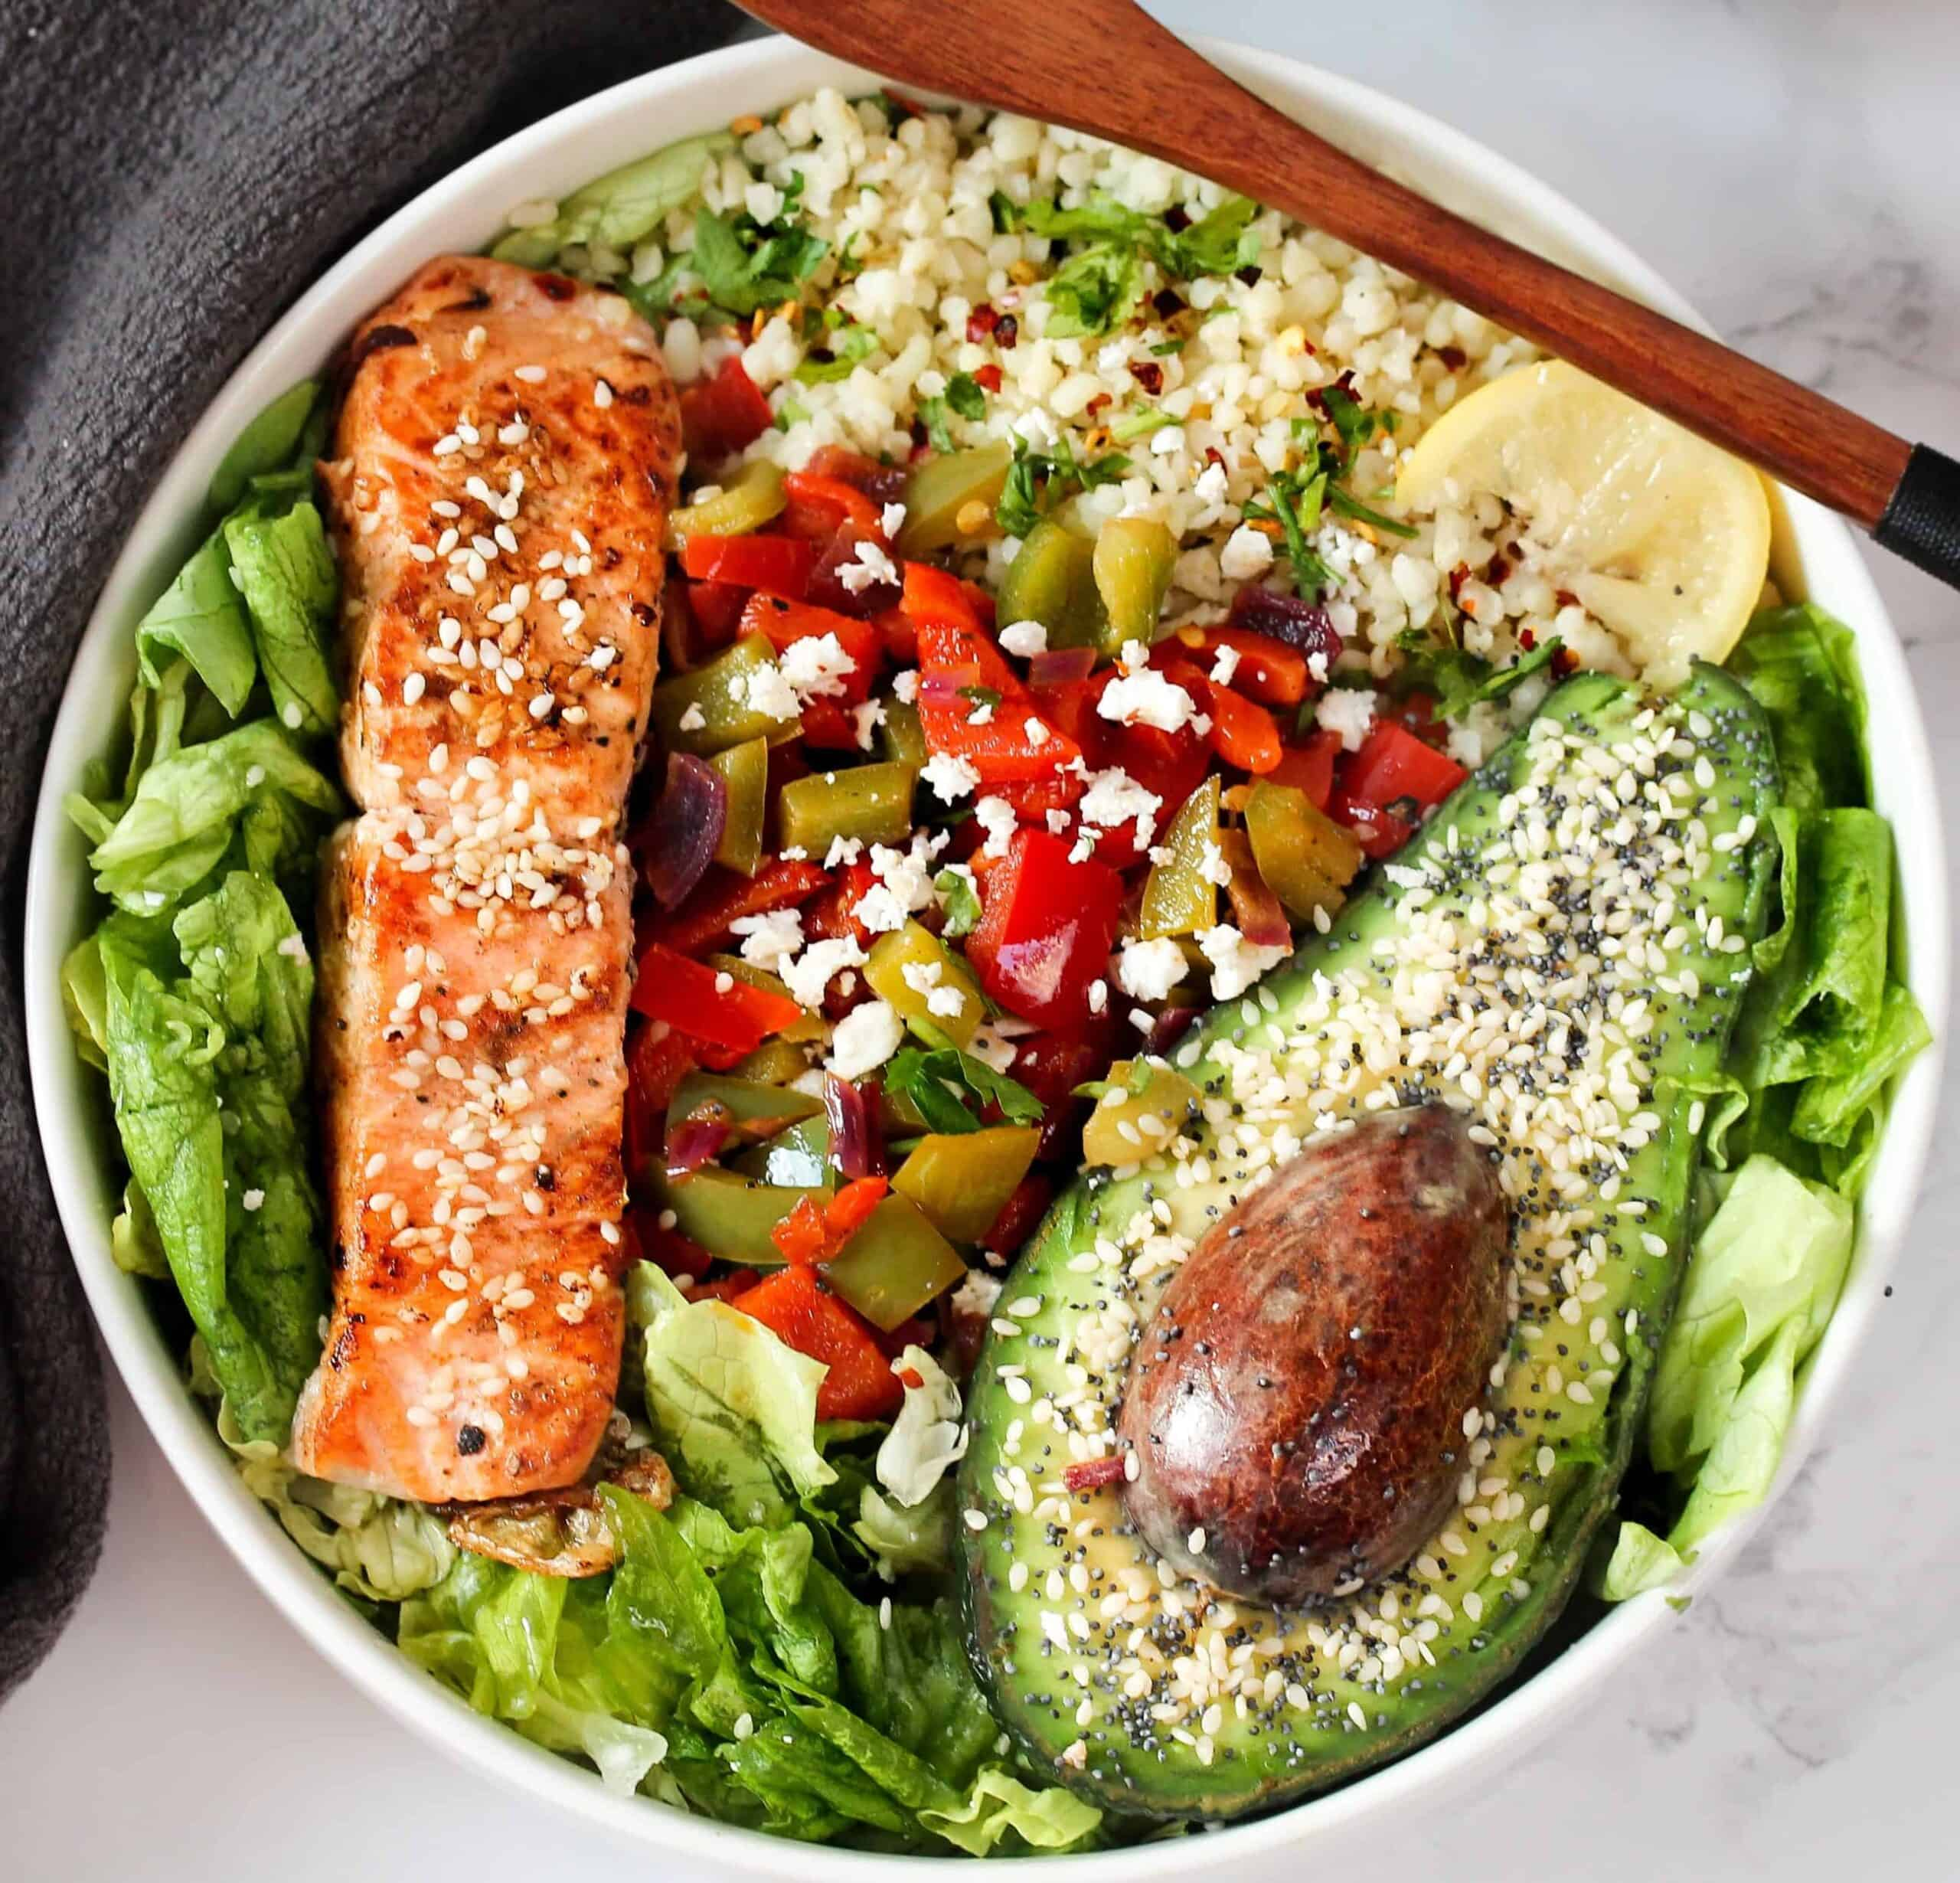 pan-fried-salmon-with-bulgur-wheat